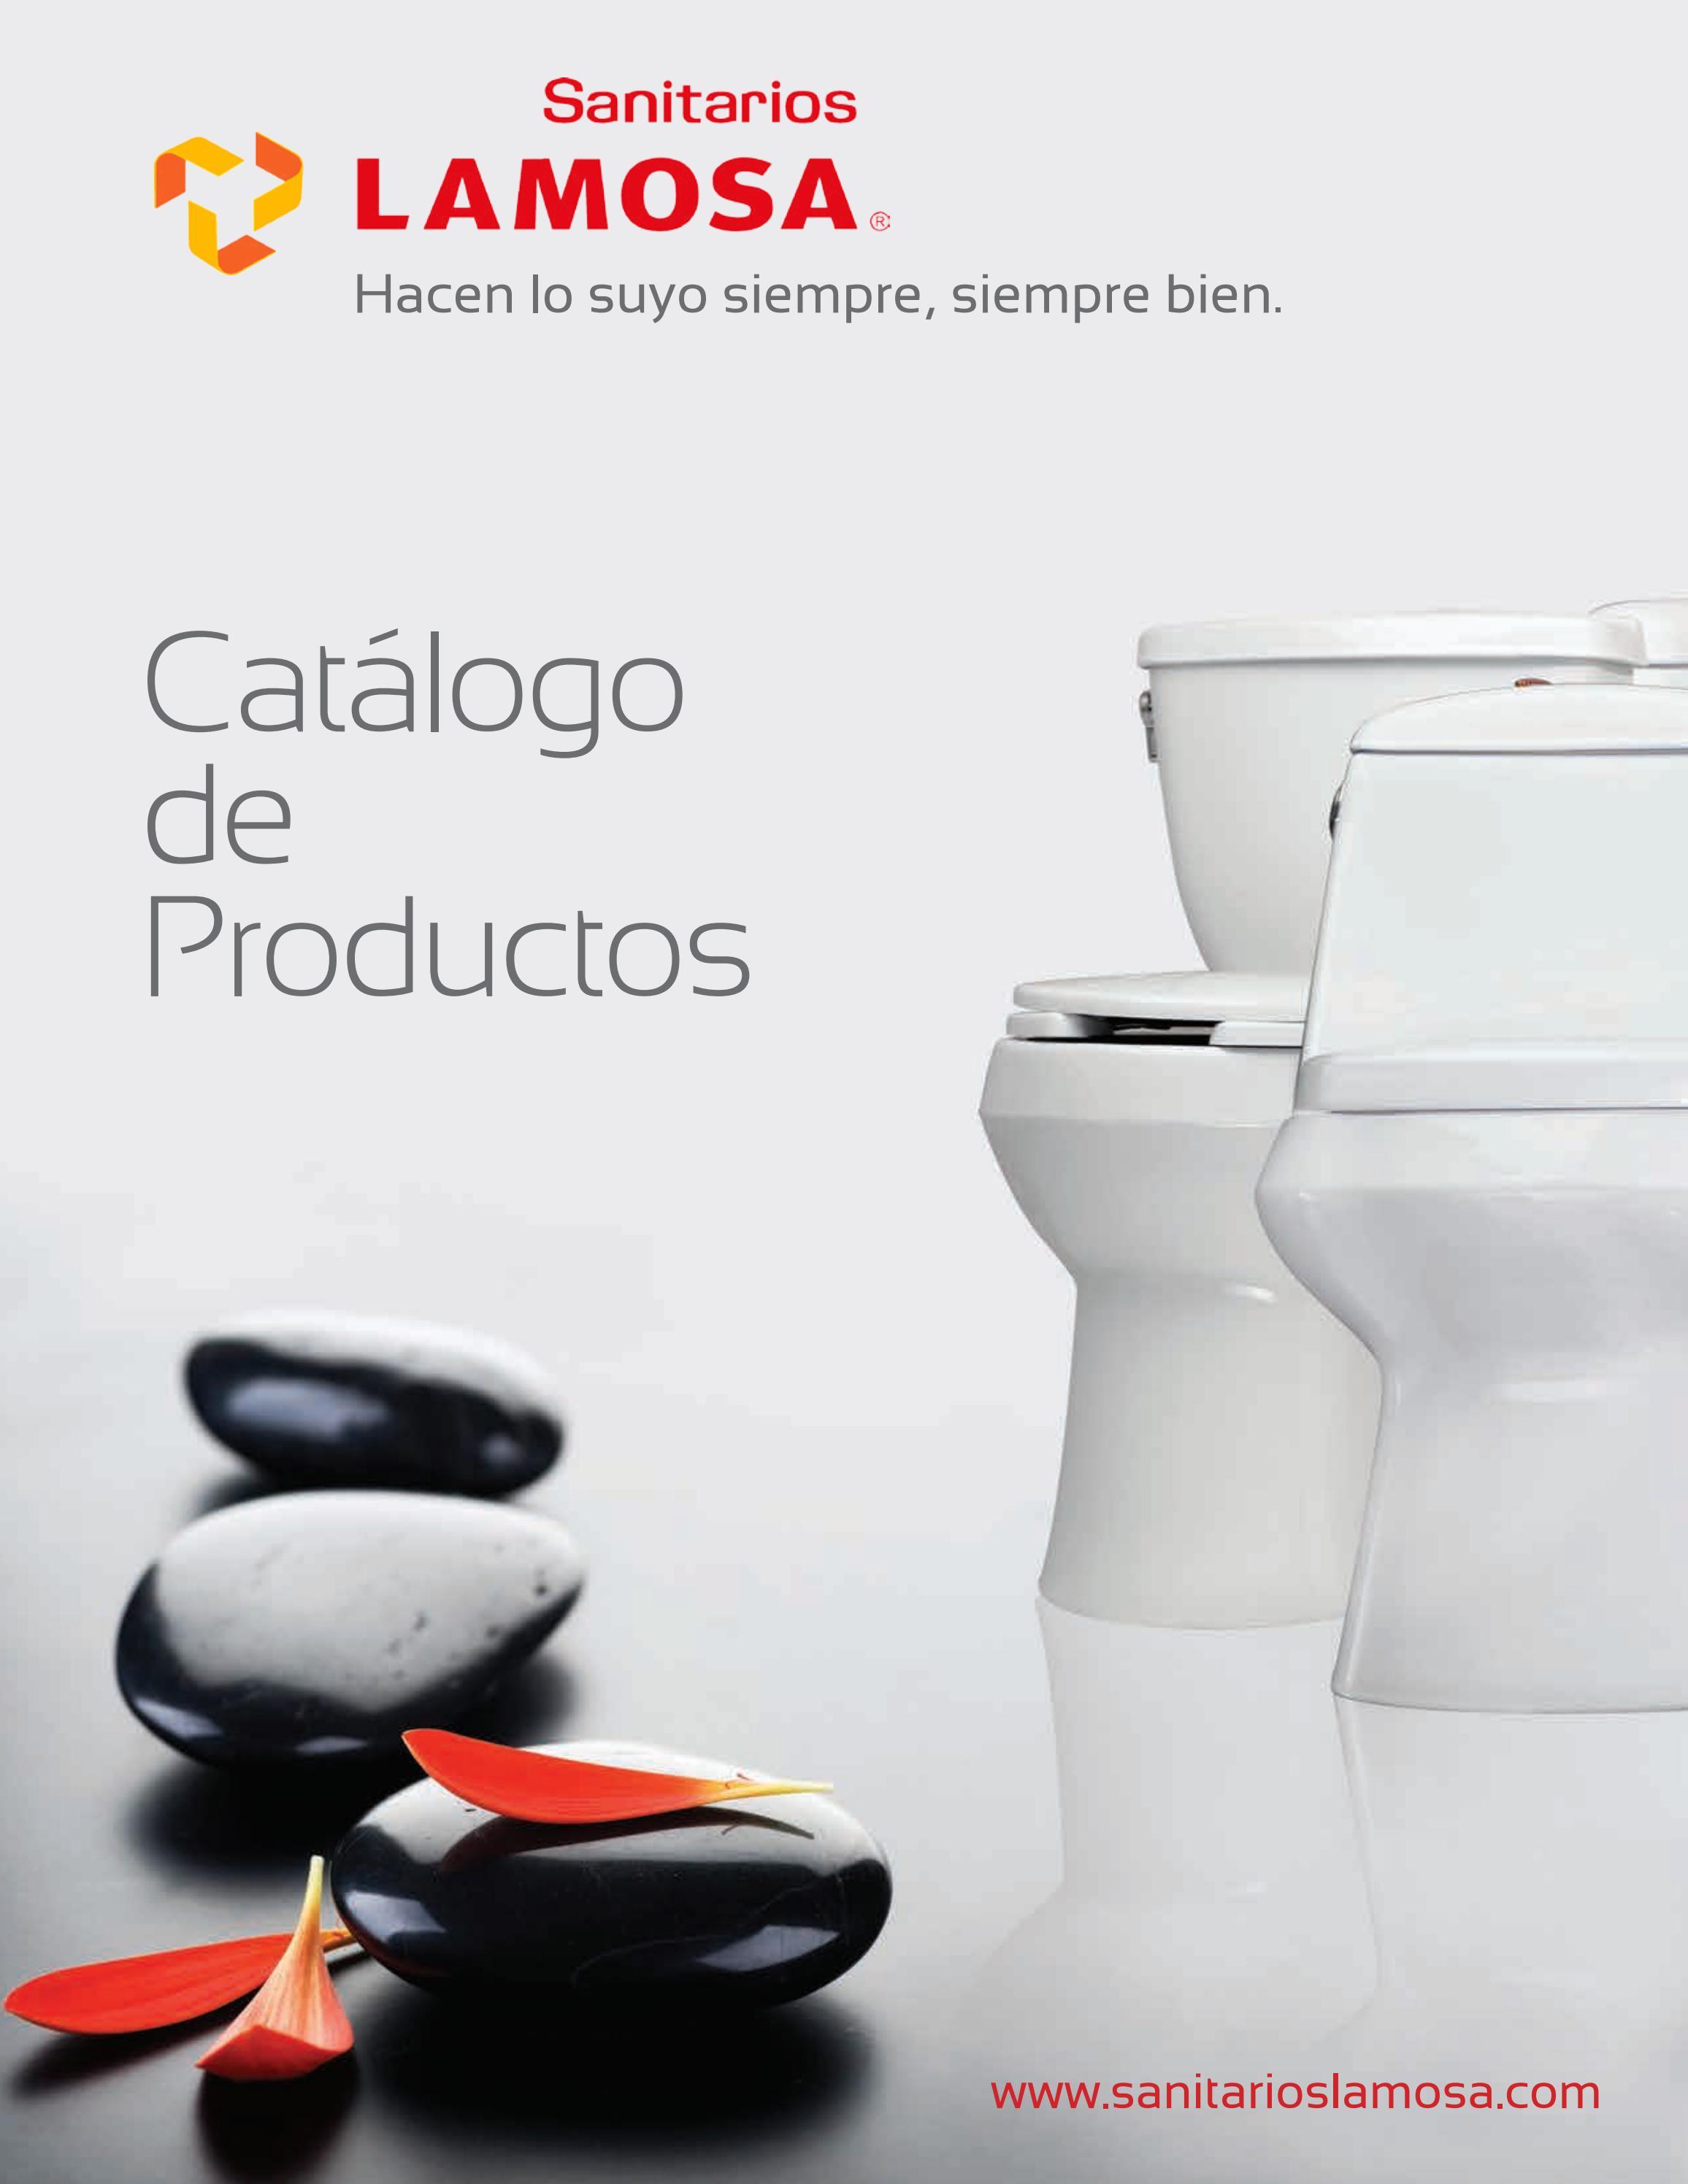 Cat Logo De Productos Lamosa By Mn Del Golfo Issuu